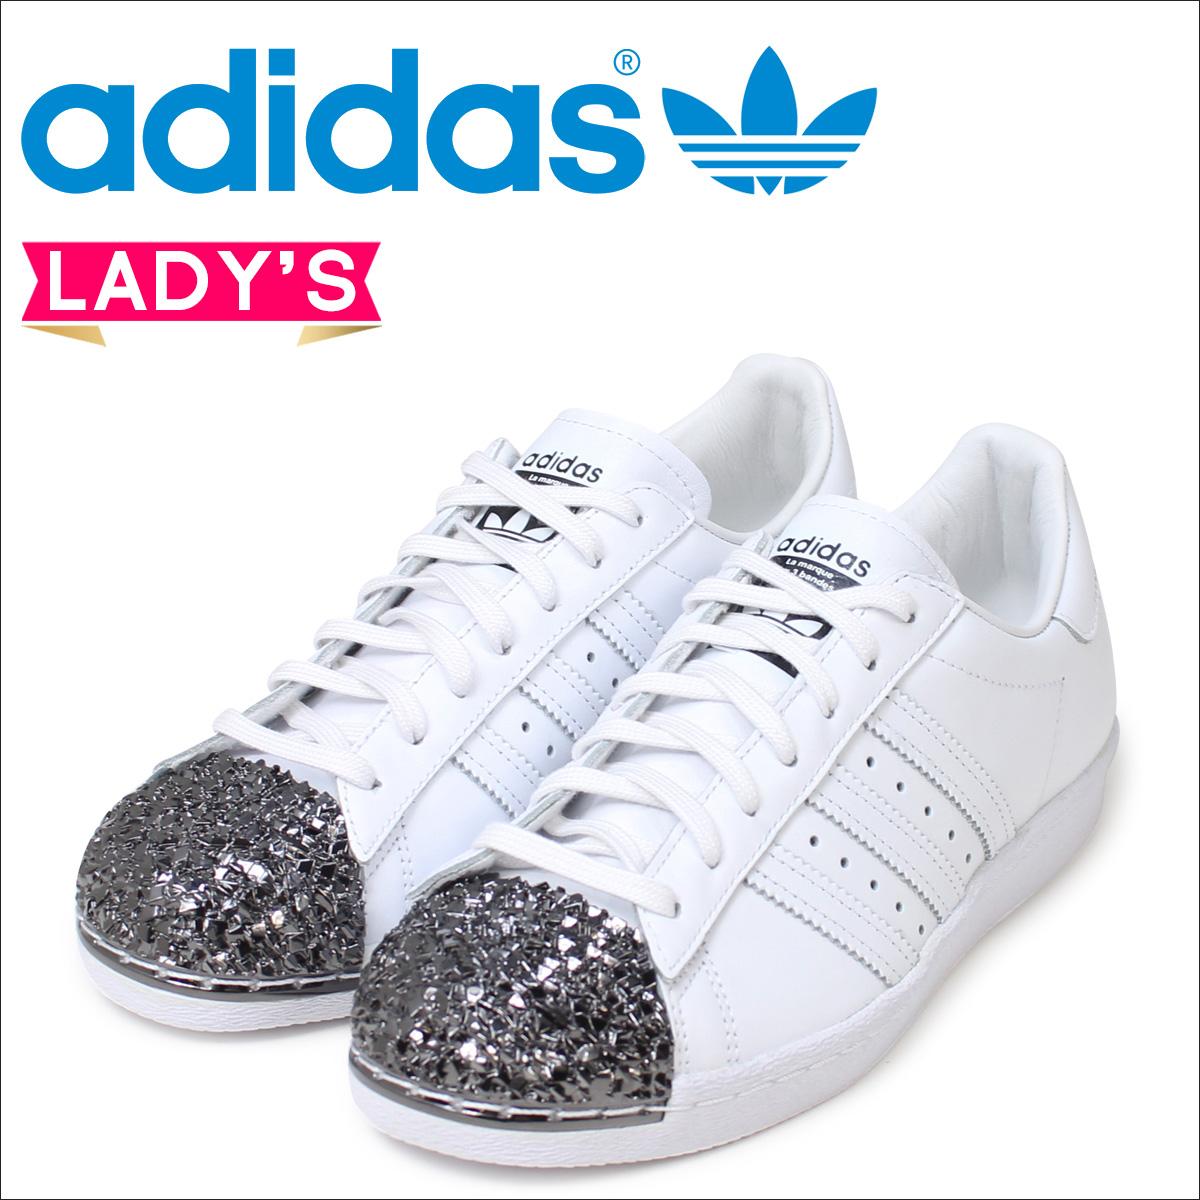 30b2156ec Buy adidas superstar 80s metal toe white > OFF70% Discounted